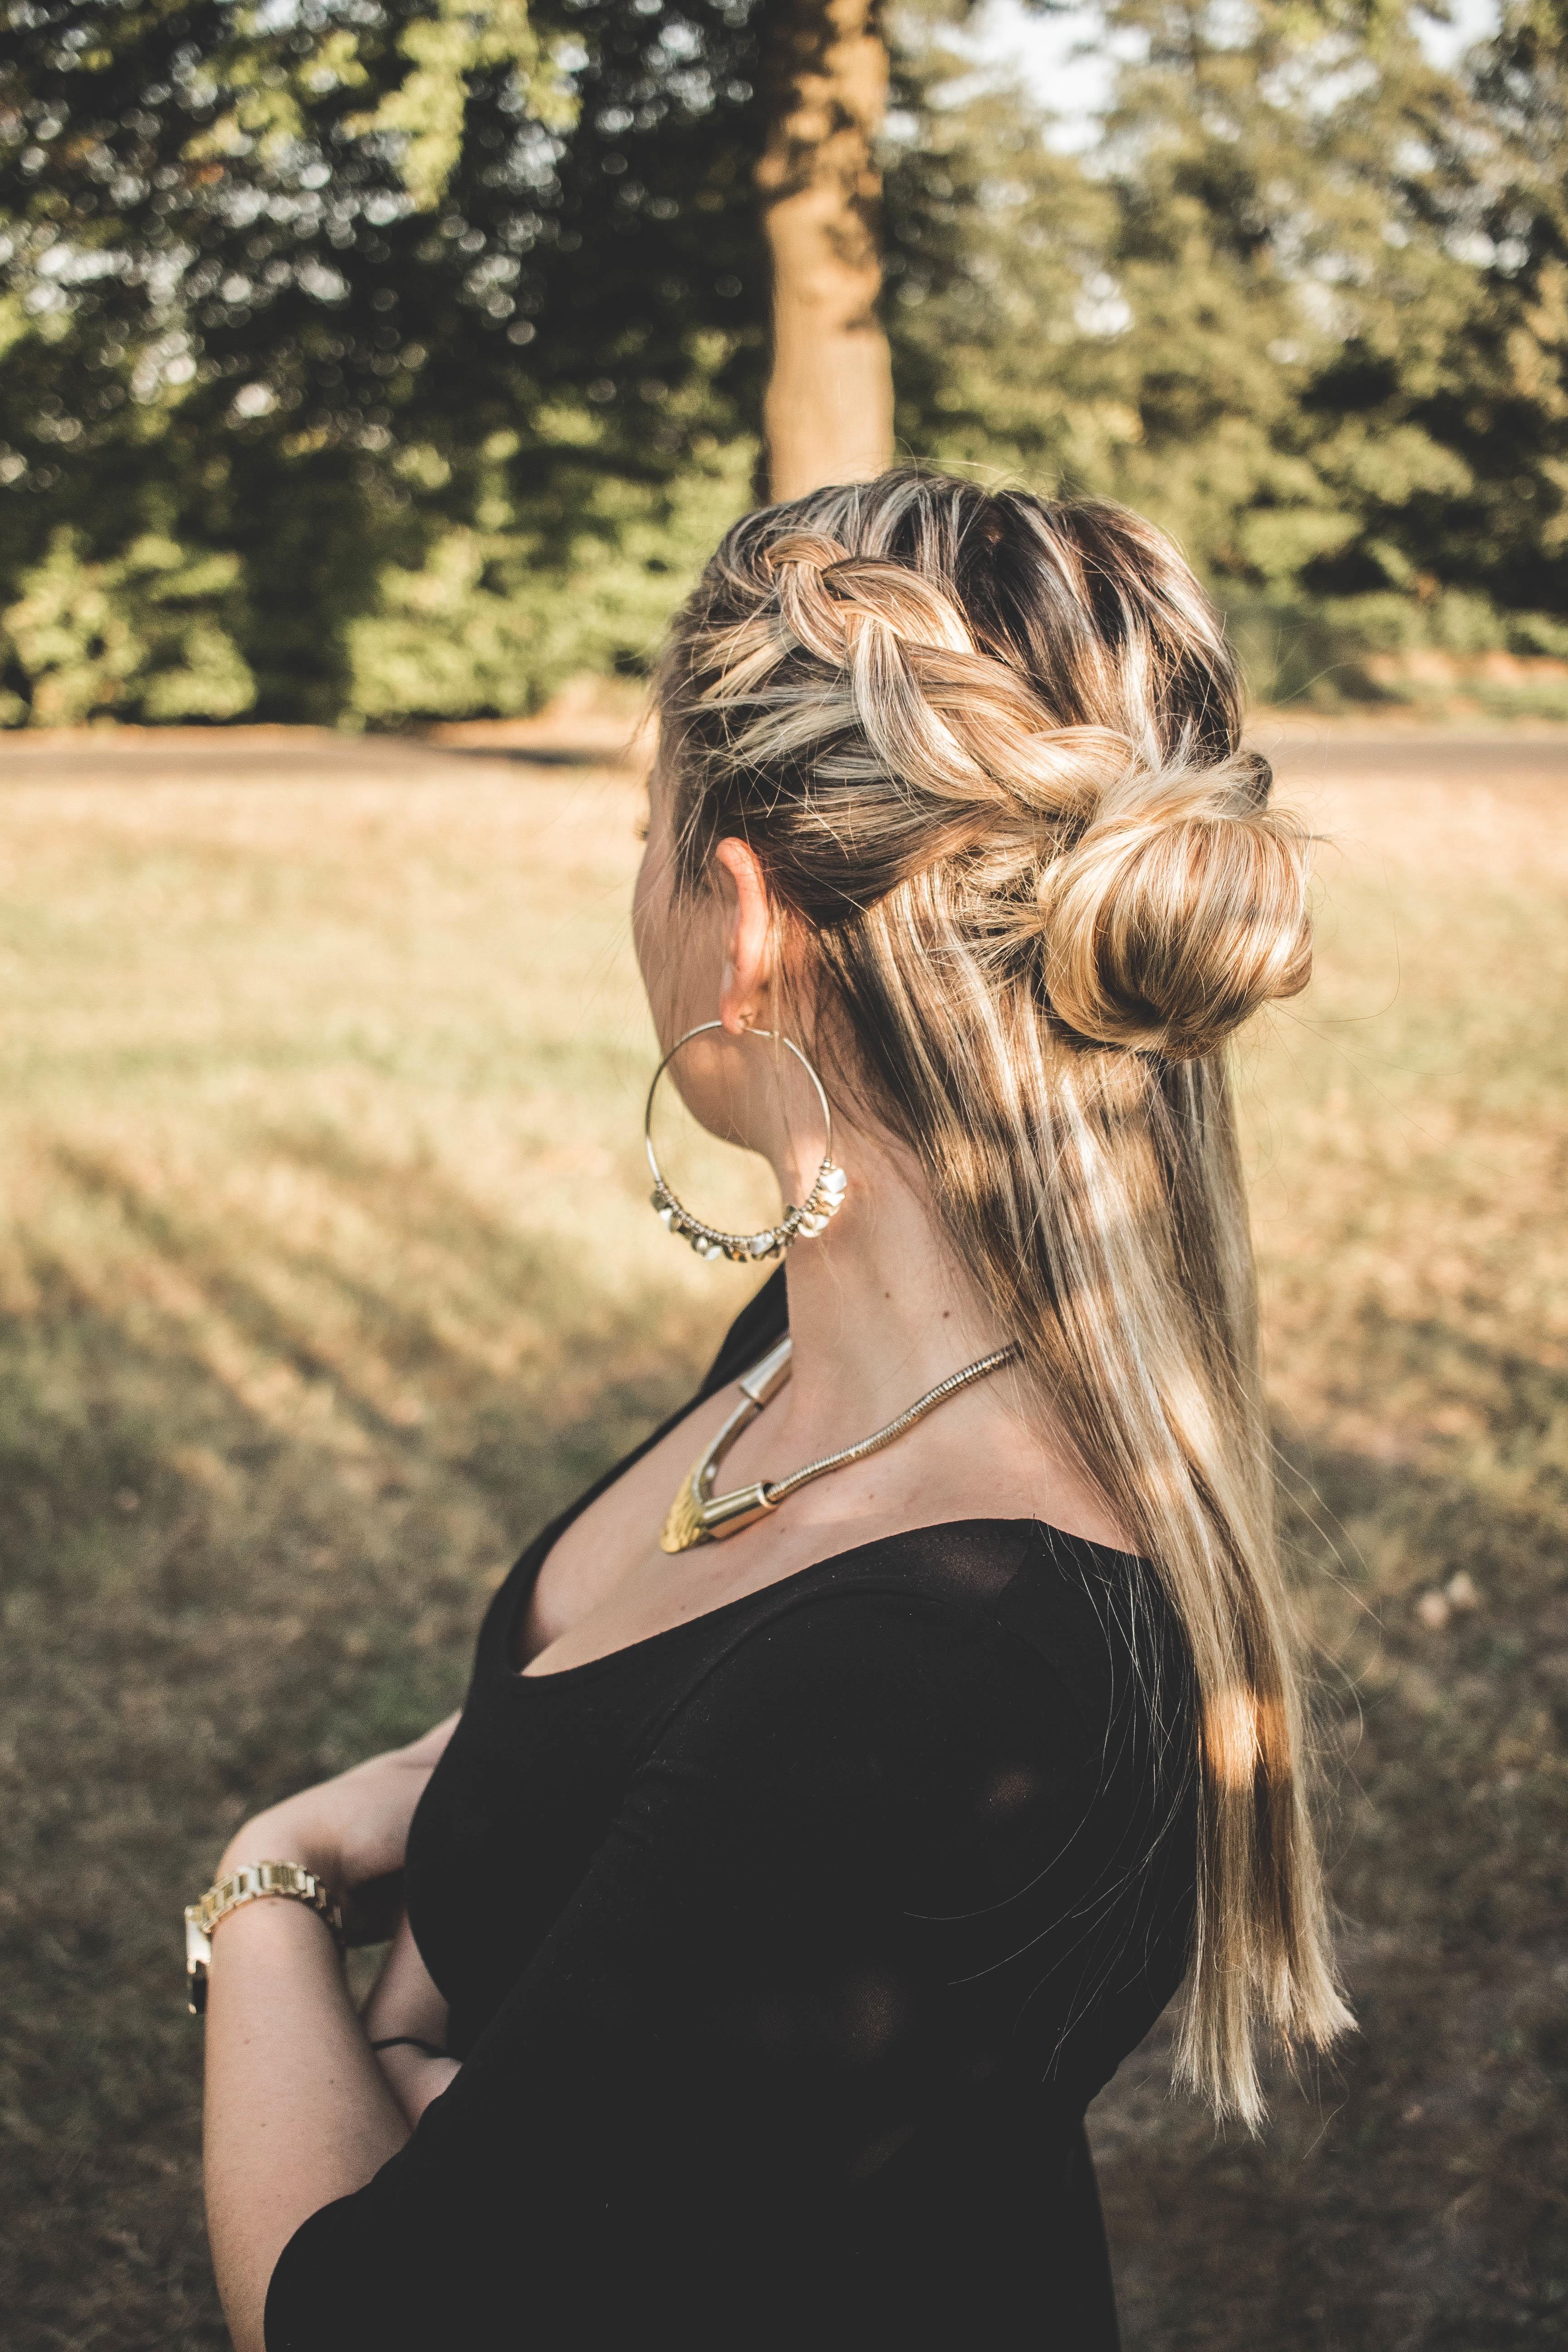 Kostenlose foto : Mädchen, Frau, Haar, Porträt, Modell-, Frühling